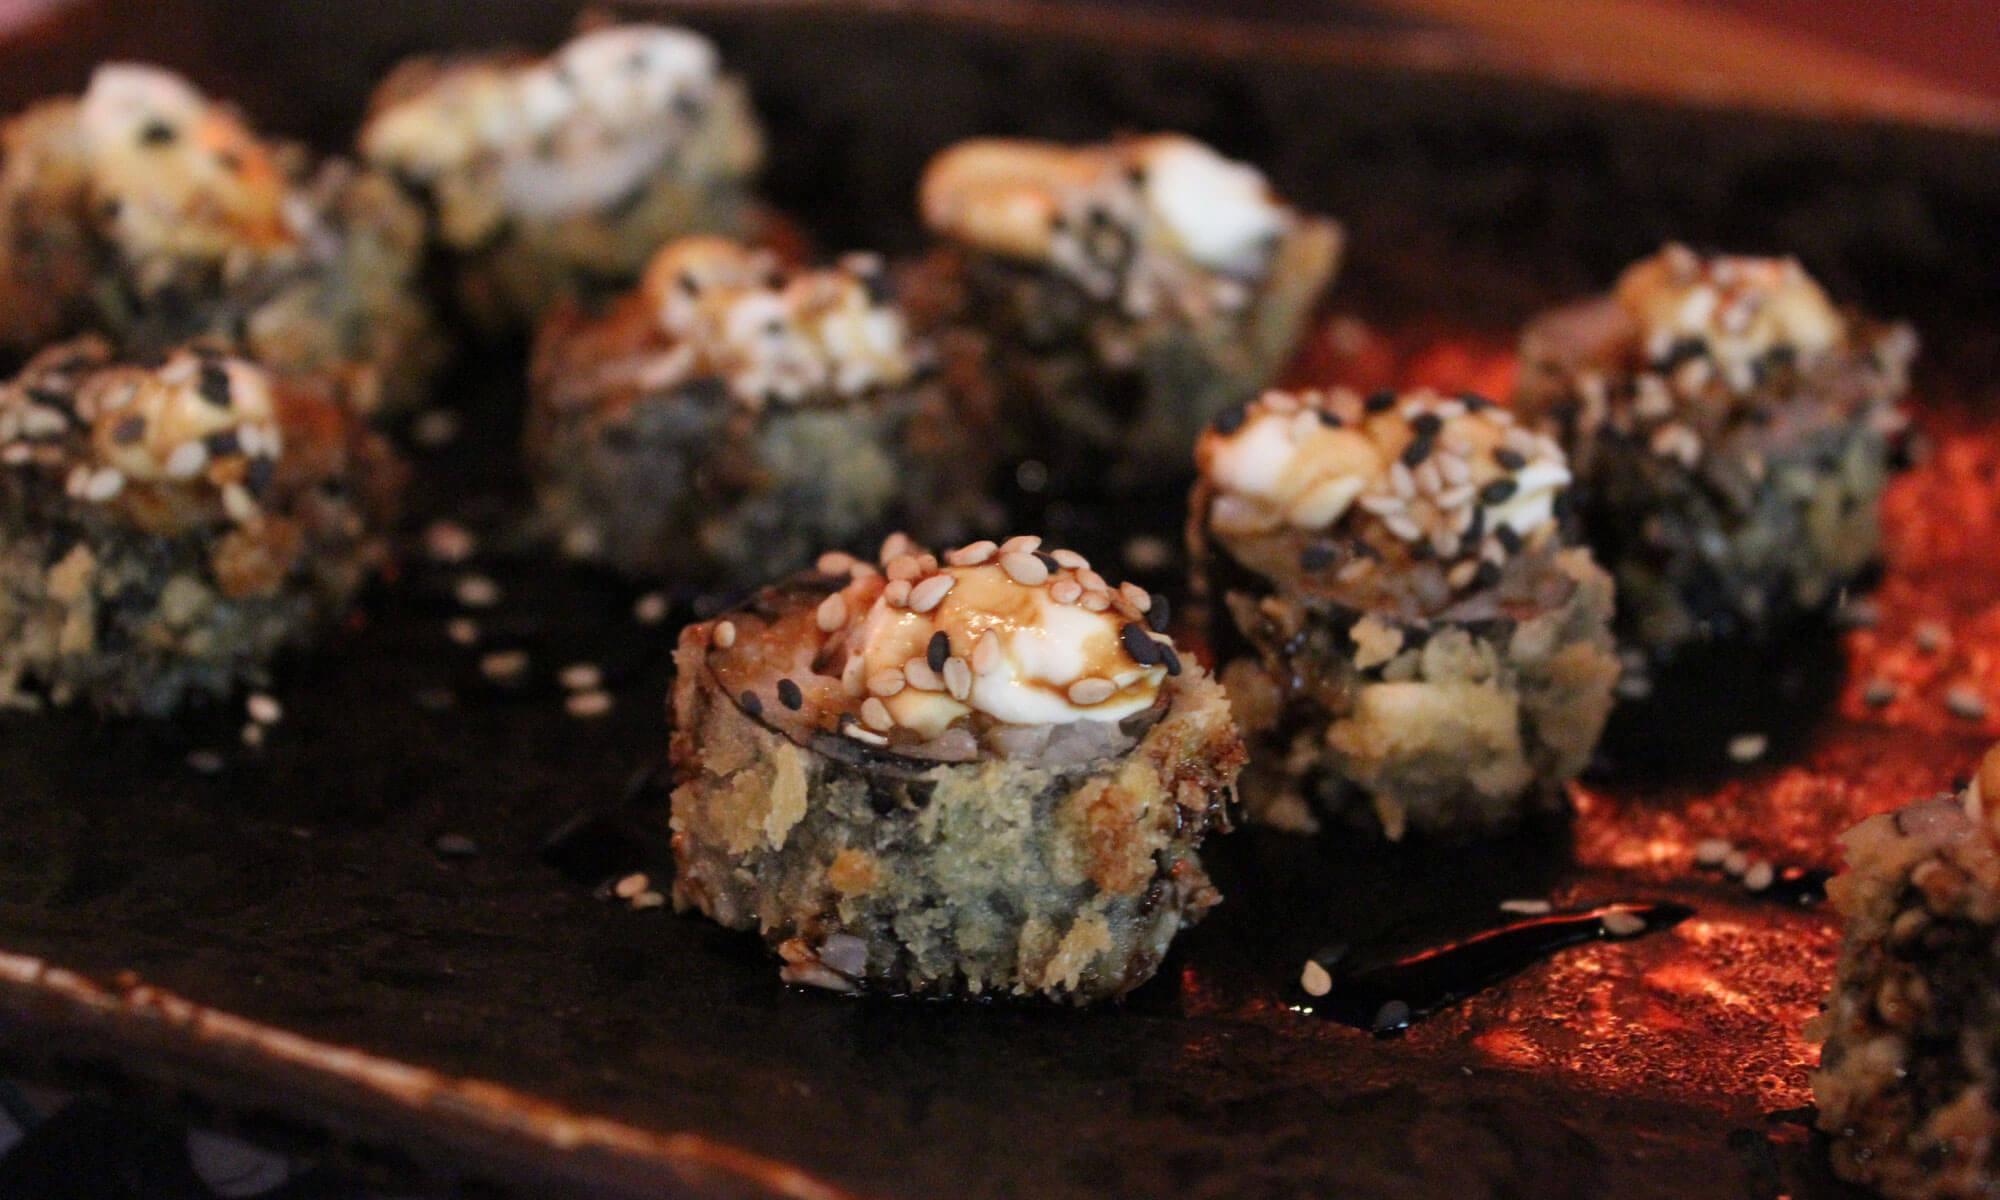 nakombi-comida-japonesa-delivery-restaurante-japones-2